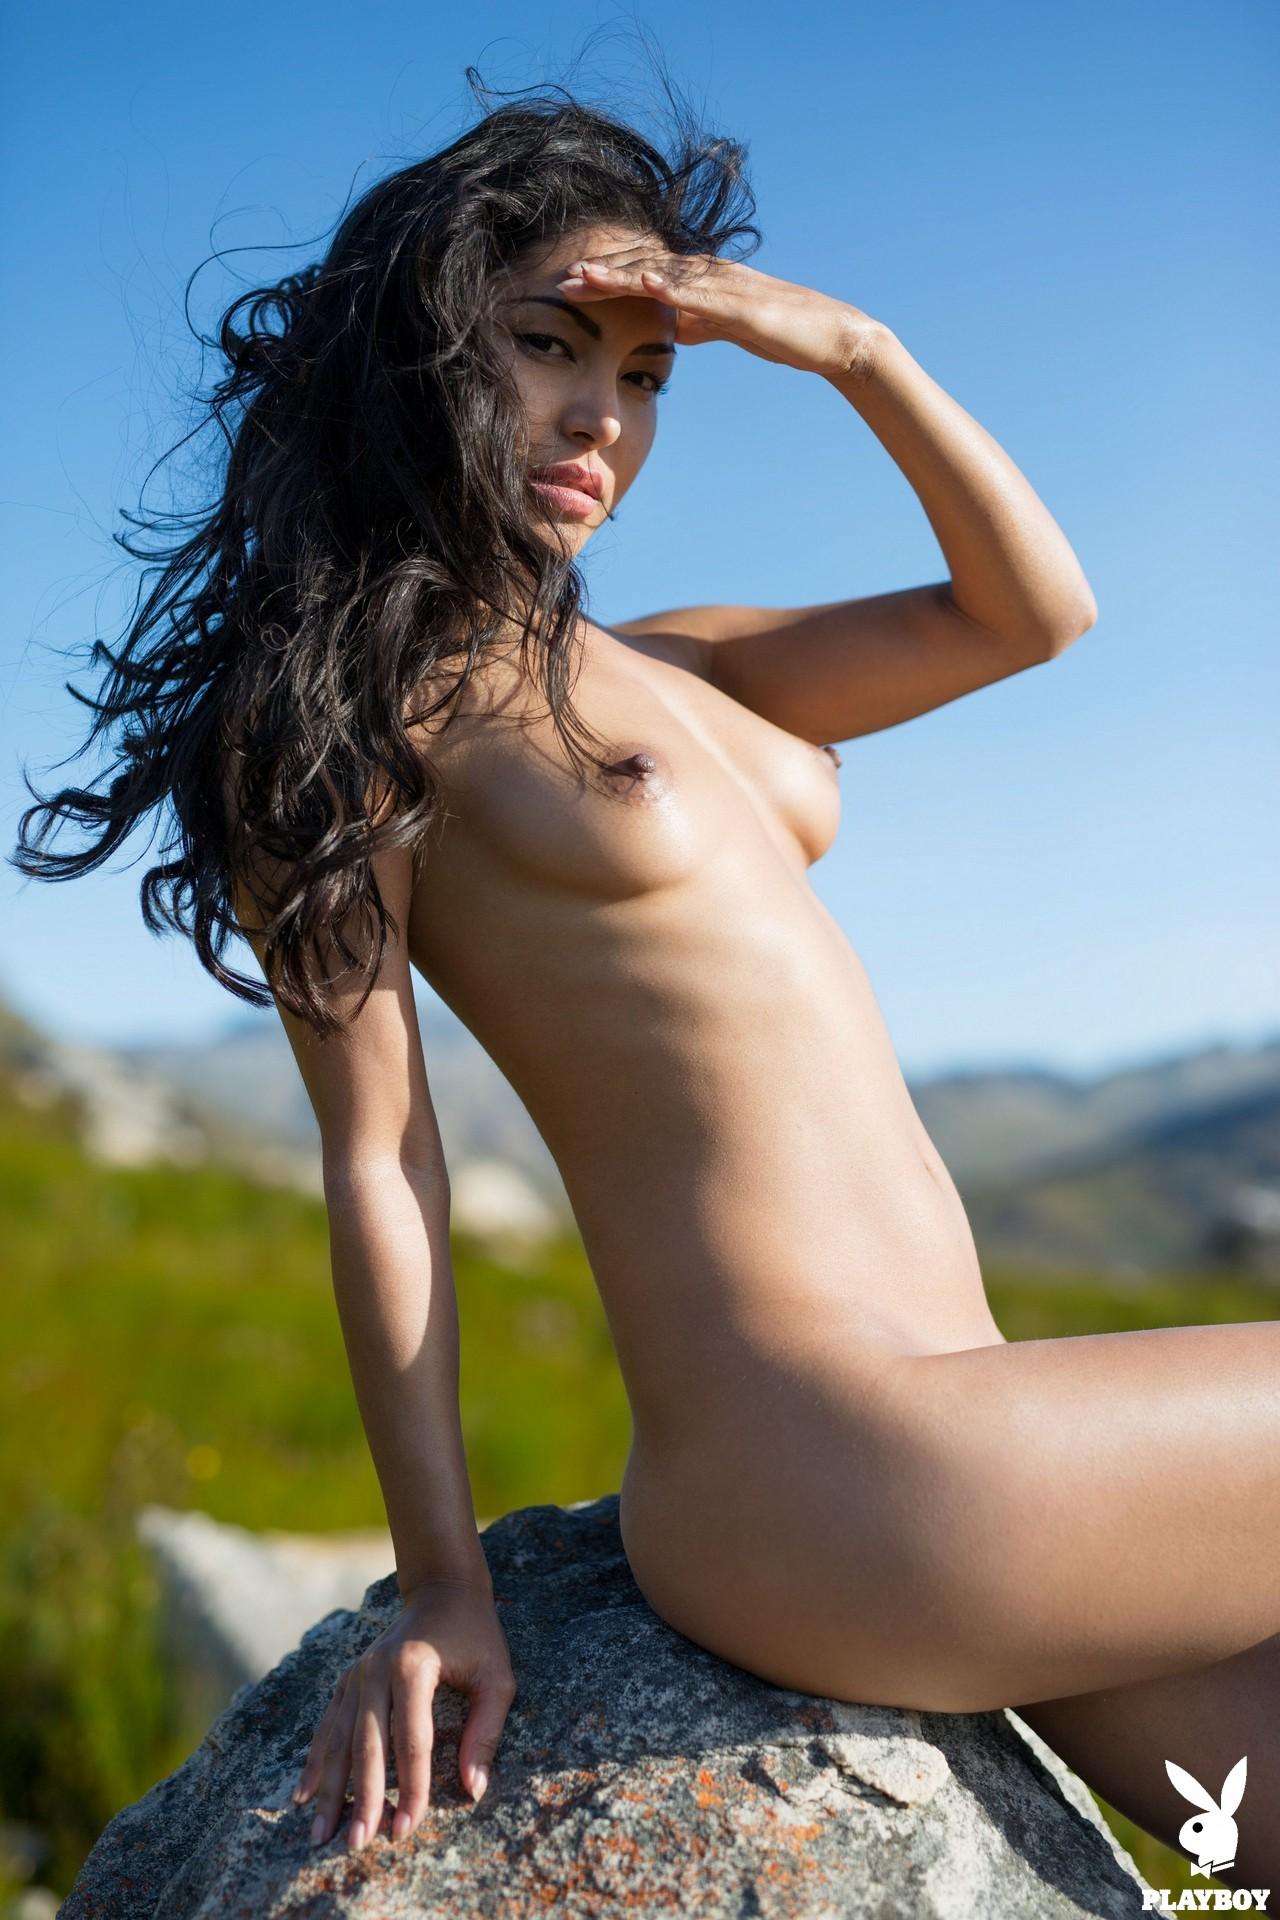 Chloe Rose in Trail Blazing 40